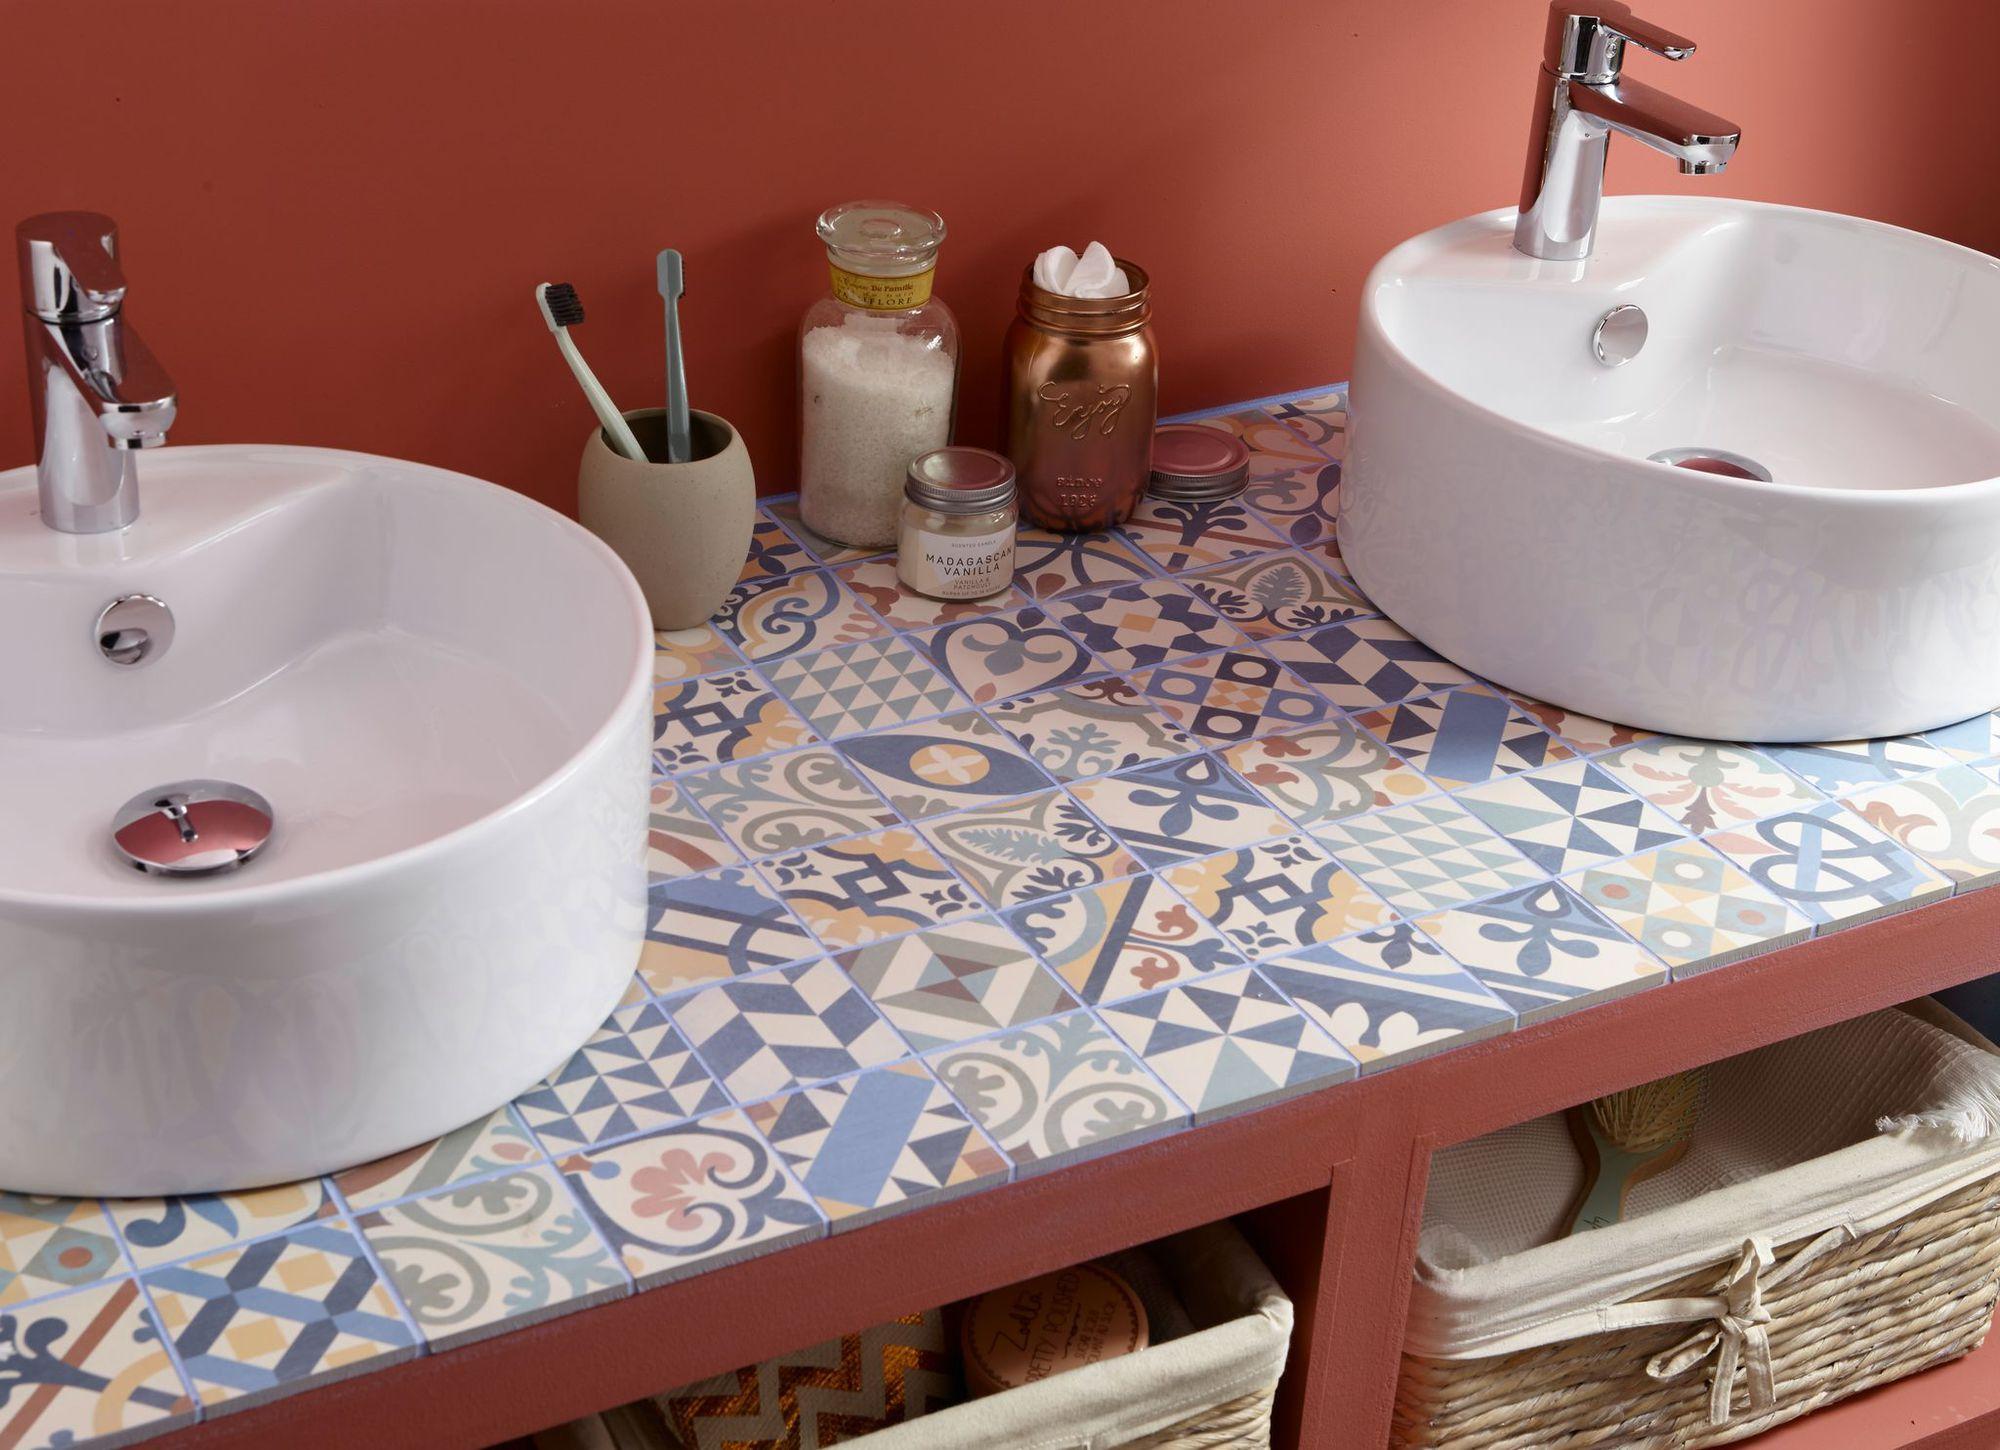 15 inspirations pour choisir sa mosa que de salle de bains for Mosaique salle de bain castorama